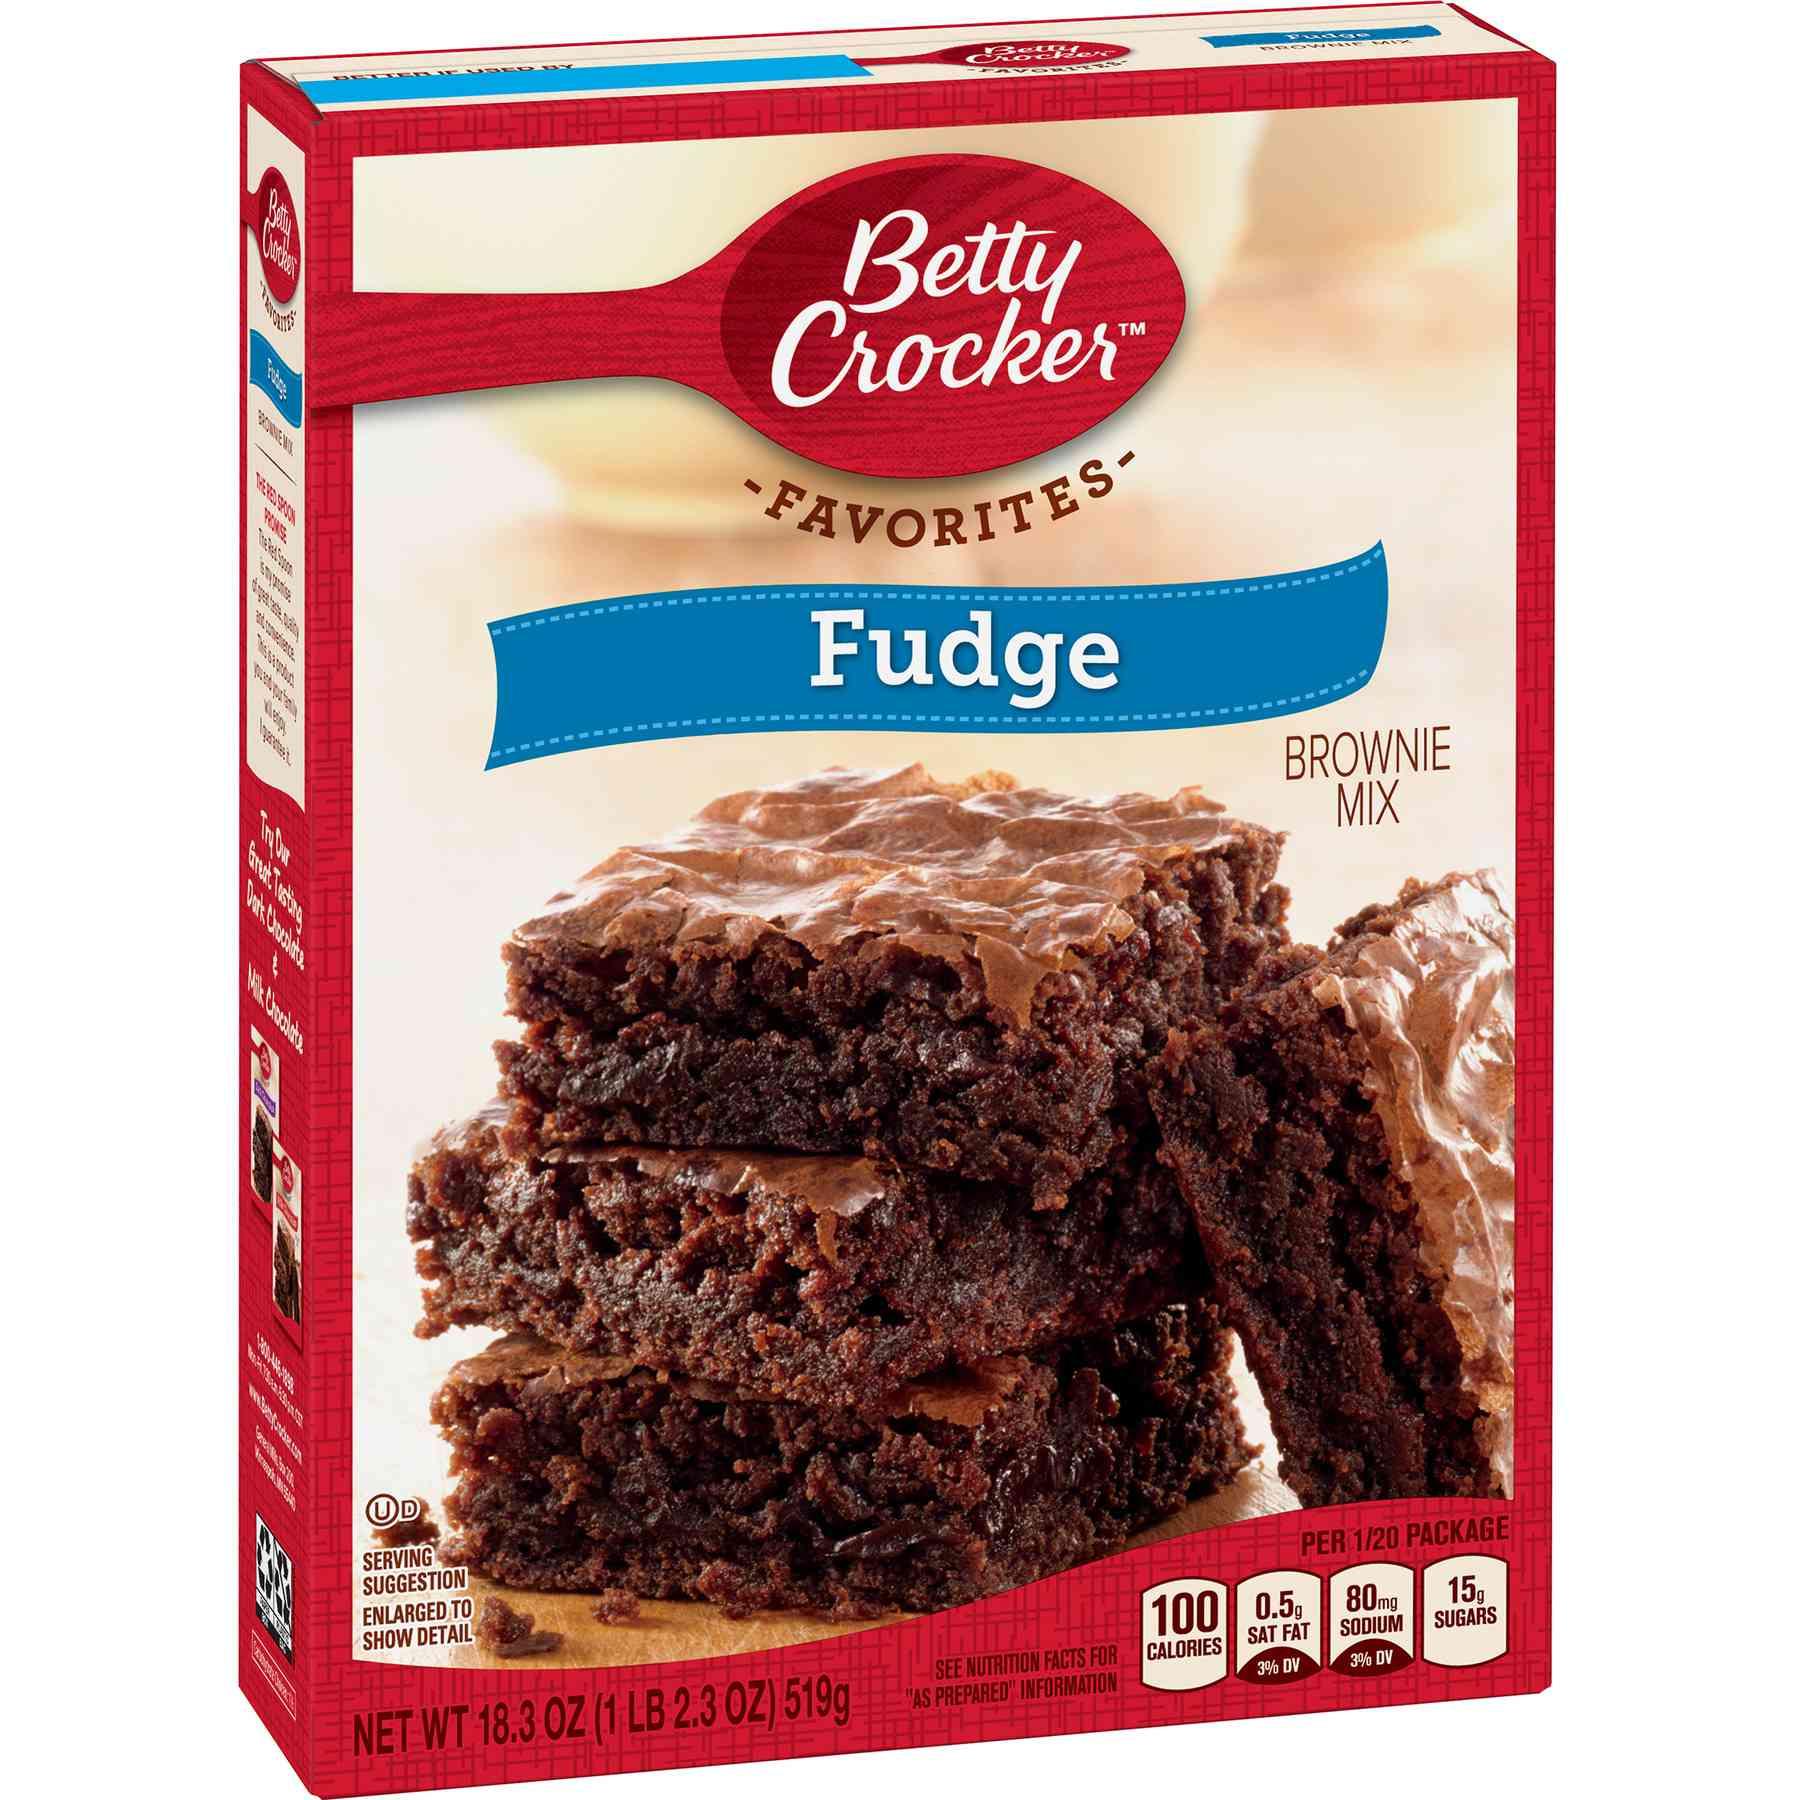 betty-crocker-fudge